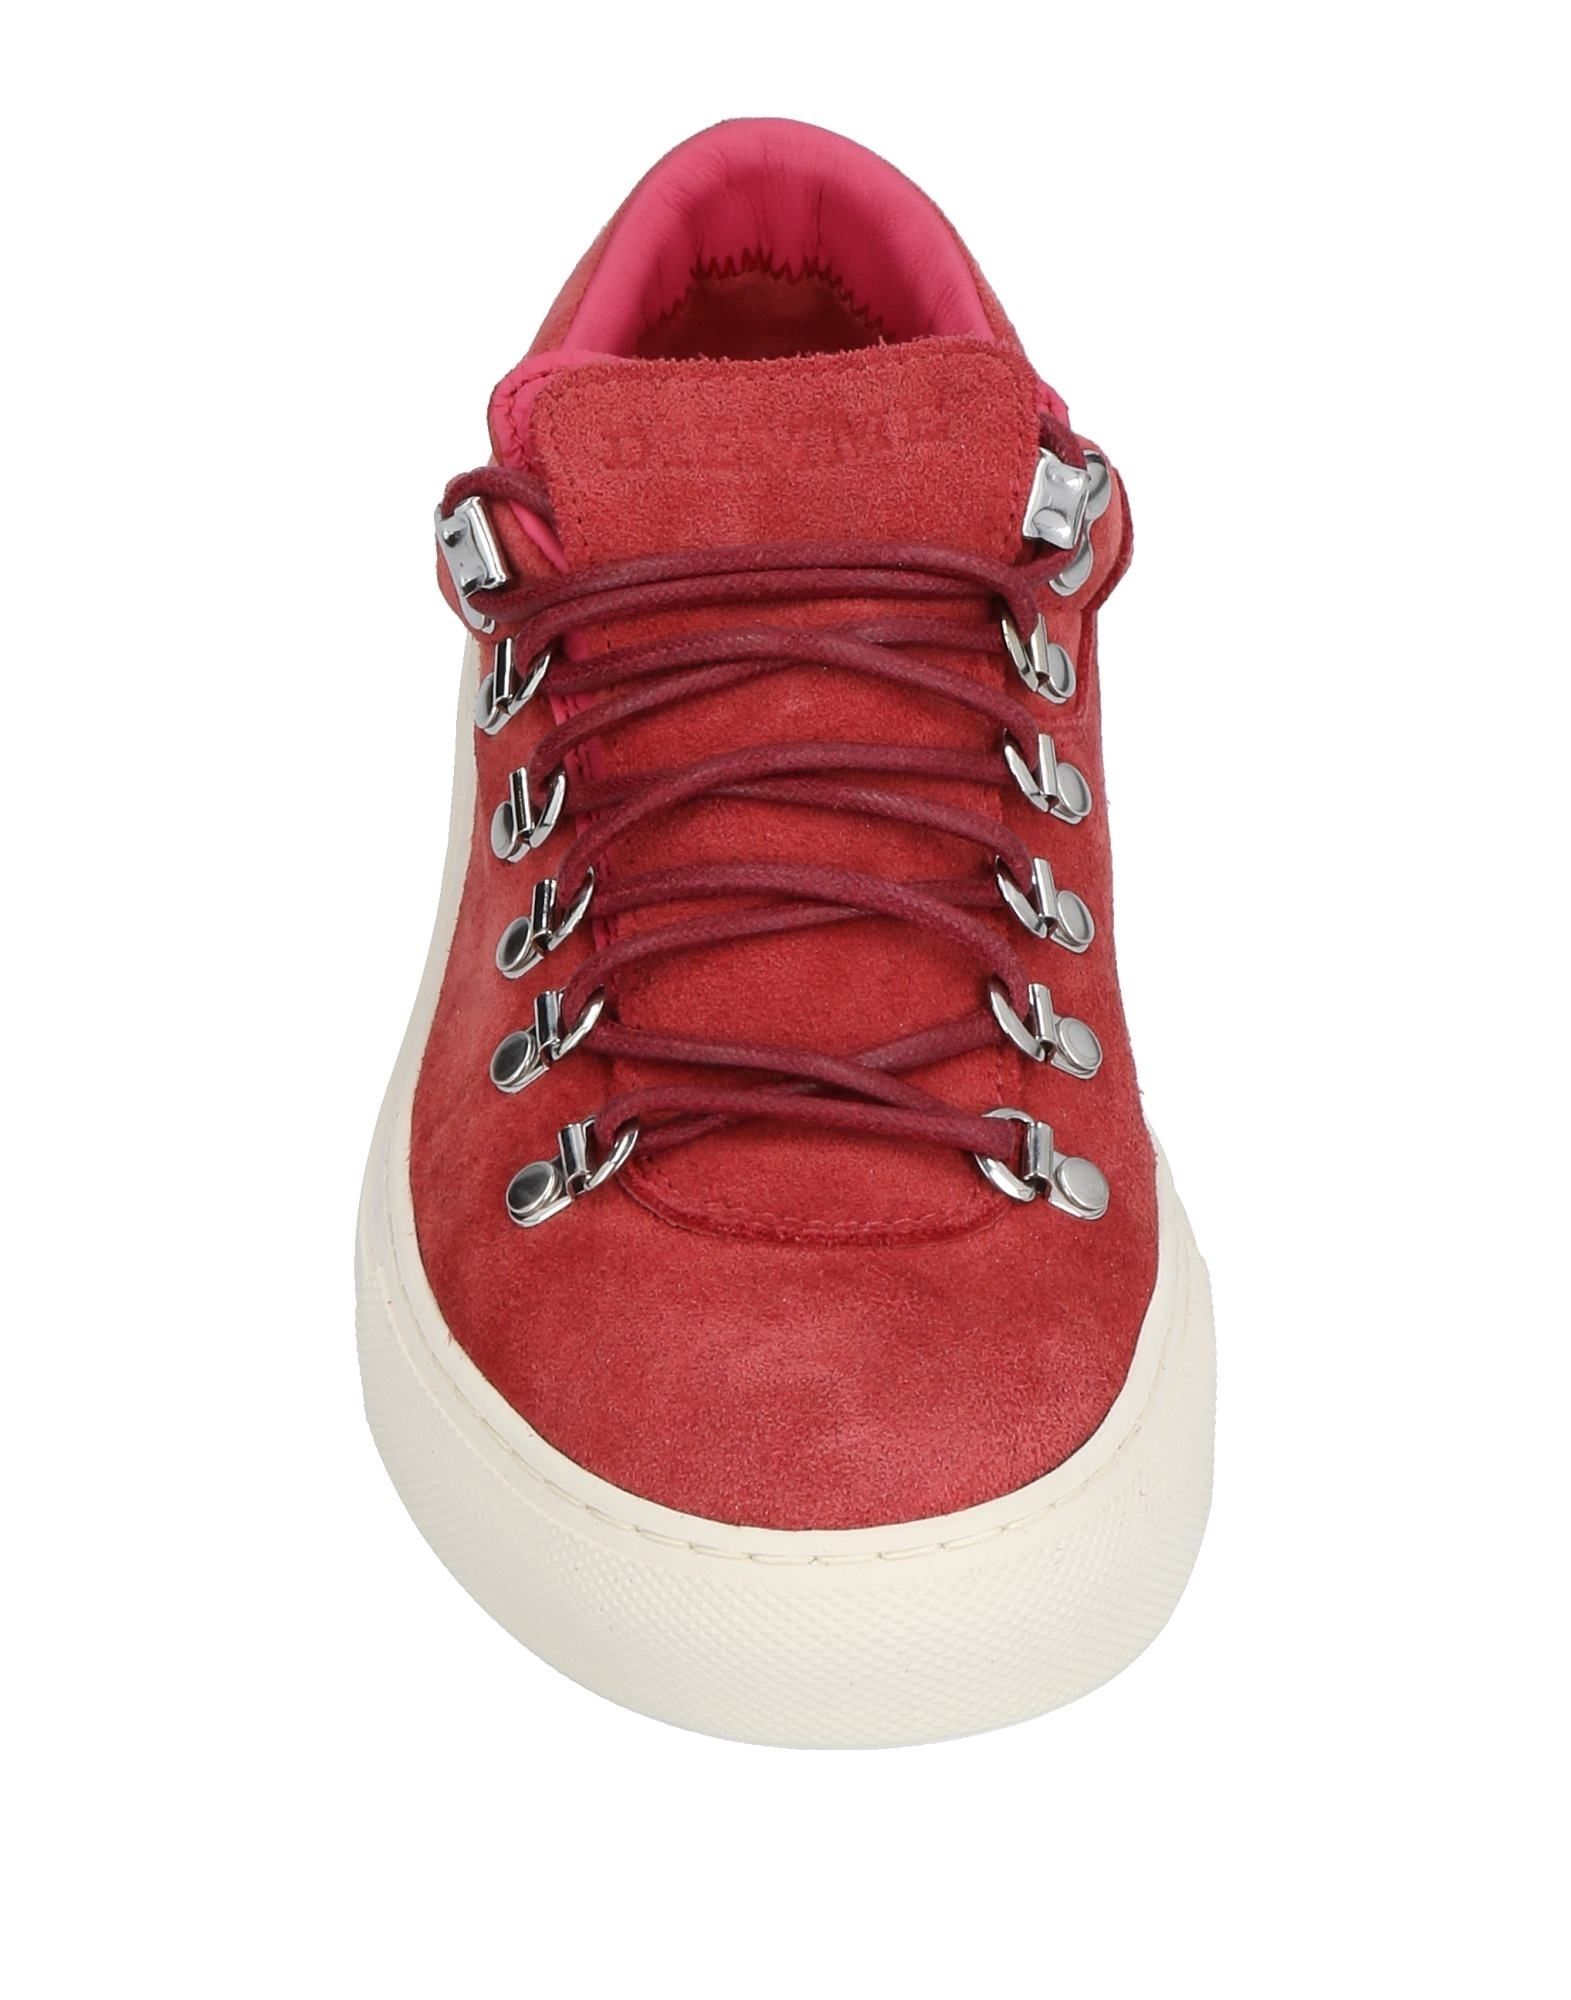 Stilvolle Diemme billige Schuhe Diemme Stilvolle Sneakers Damen  11500873MH a35fa4